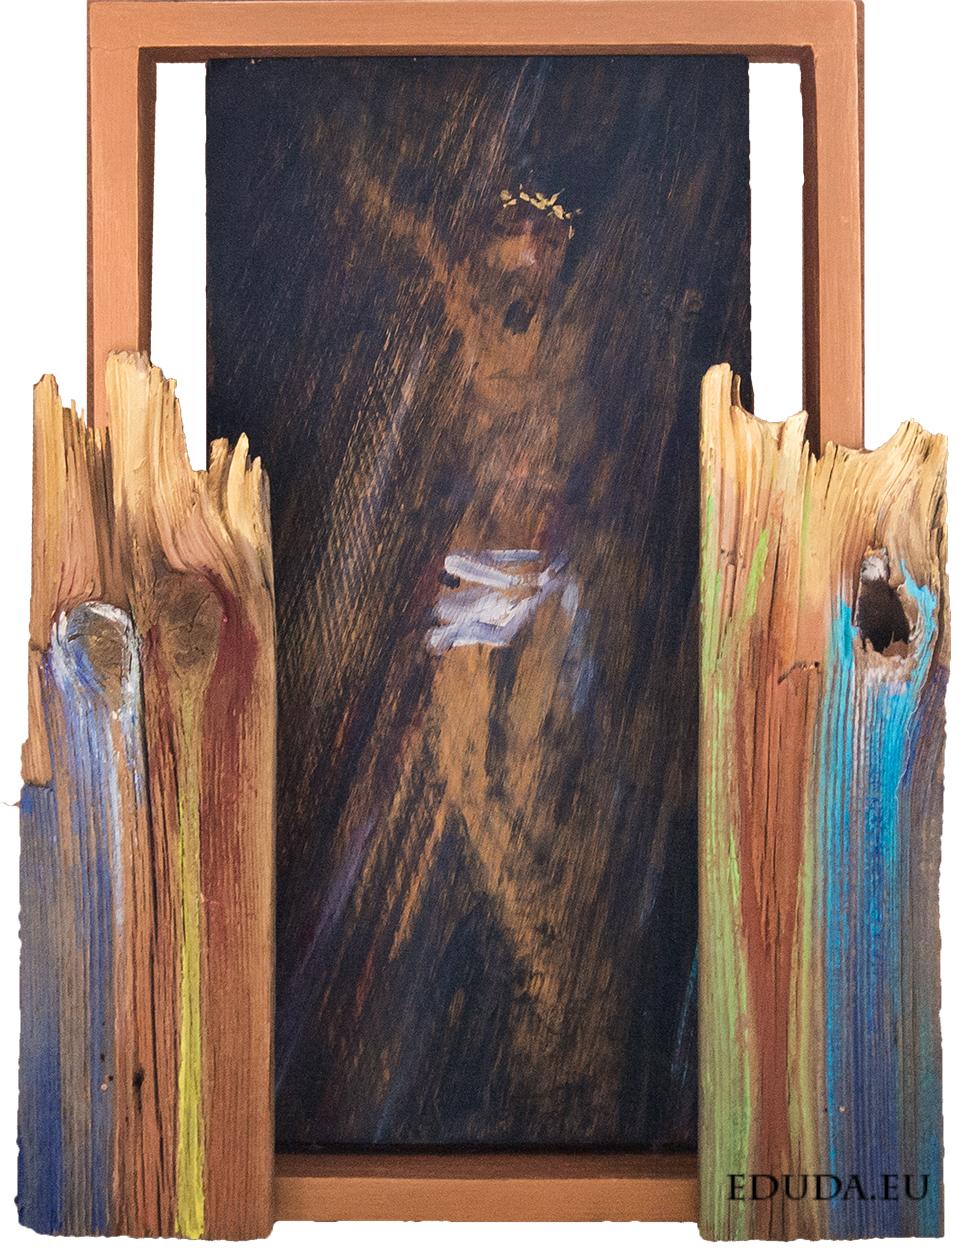 Kapliczusia II 51x38 cm / mal. Edward Duda